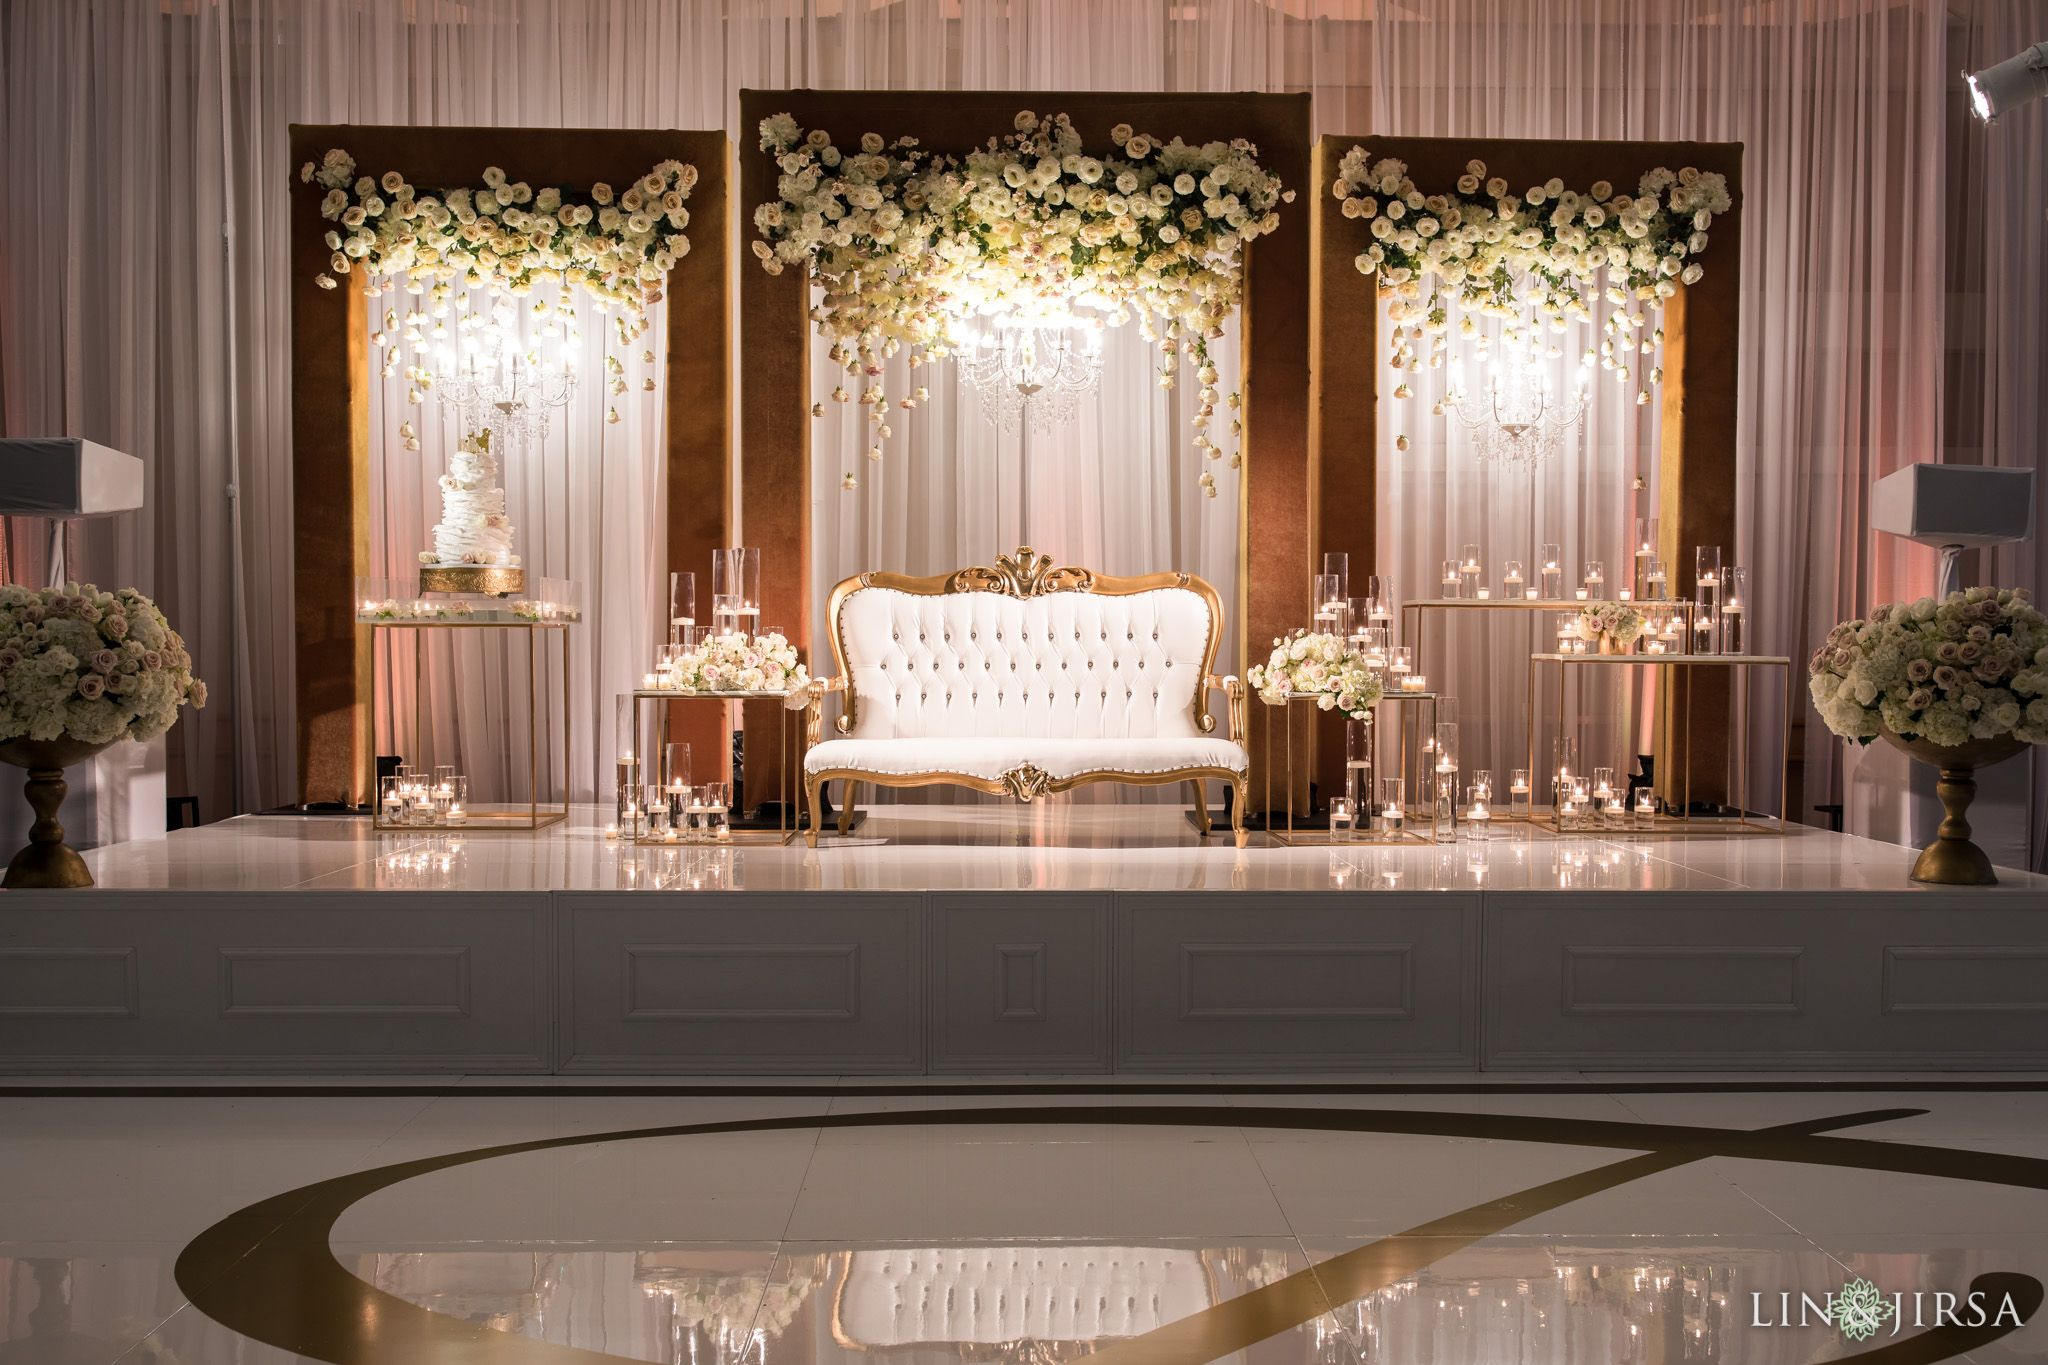 Hotel Irvine New Year's Eve Indian Wedding | Wedding stage ...